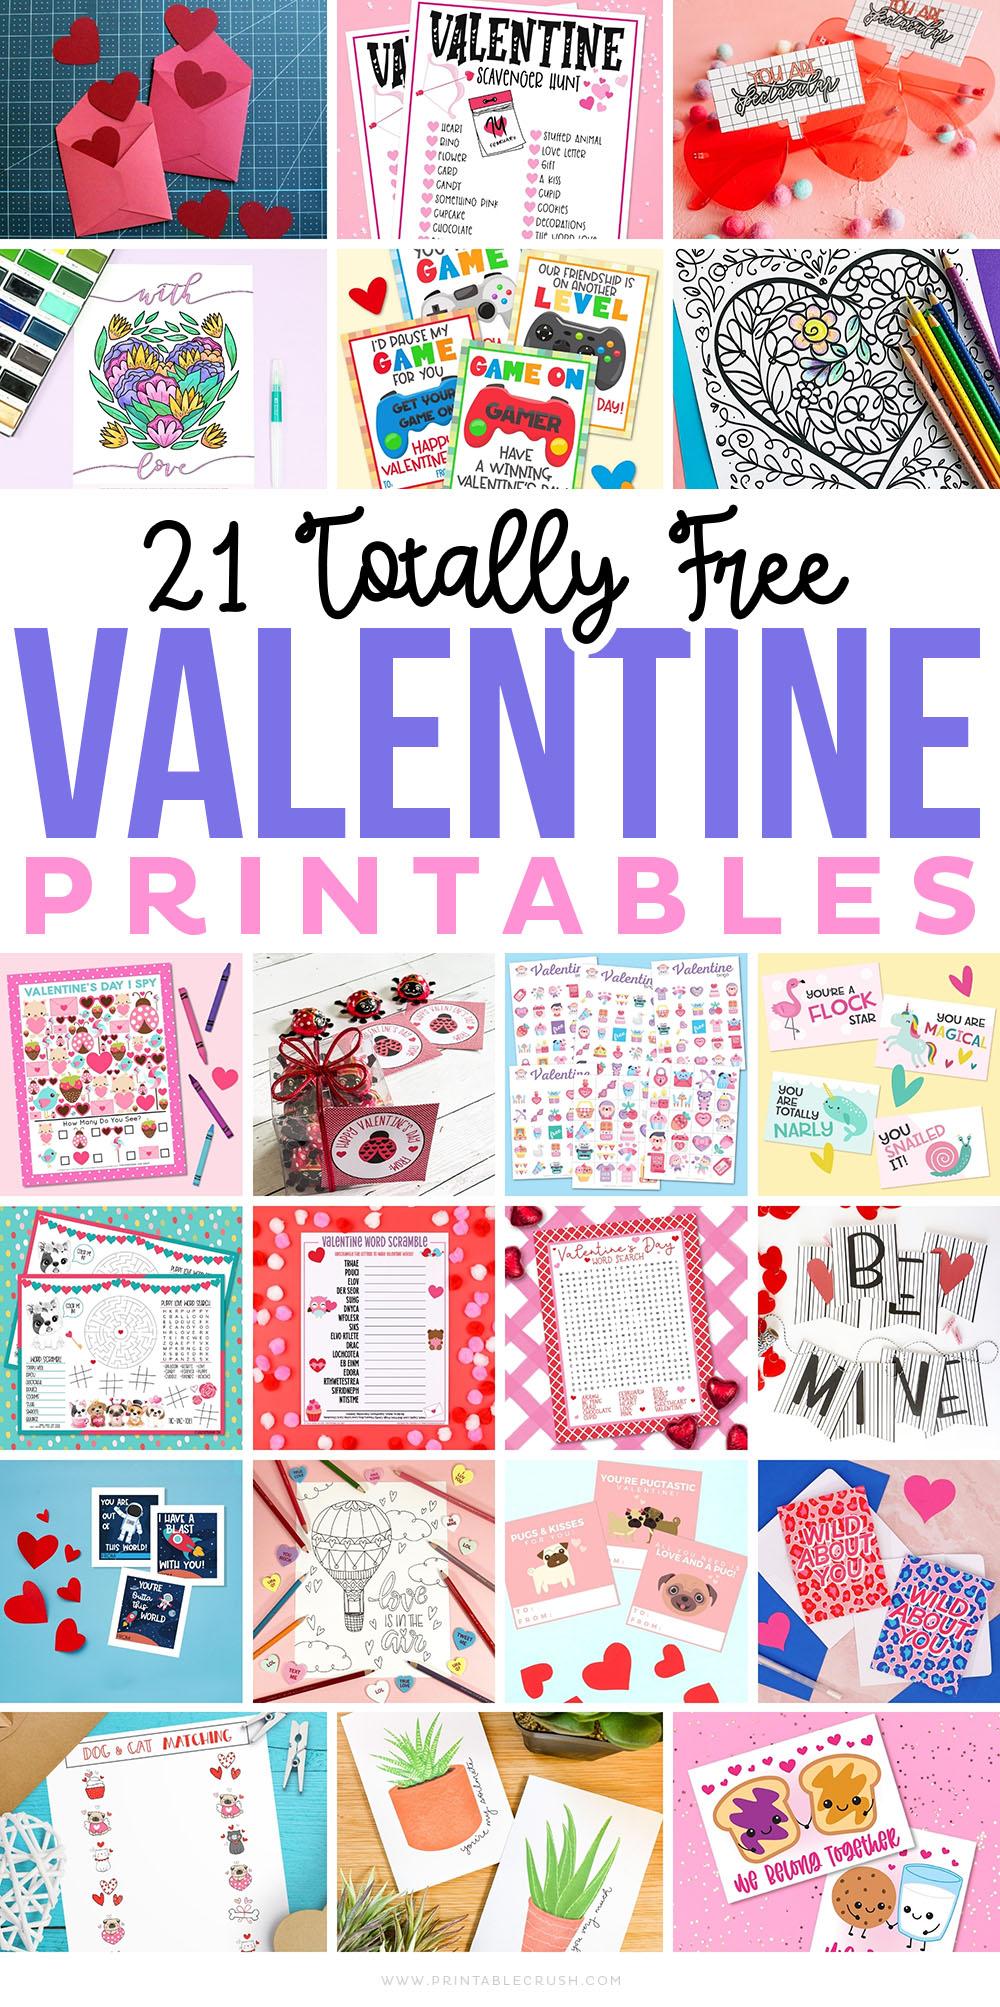 21 Free Valentine's Day Printables - Printables for Valentine's Day - Valentine Printables -Printable Crush